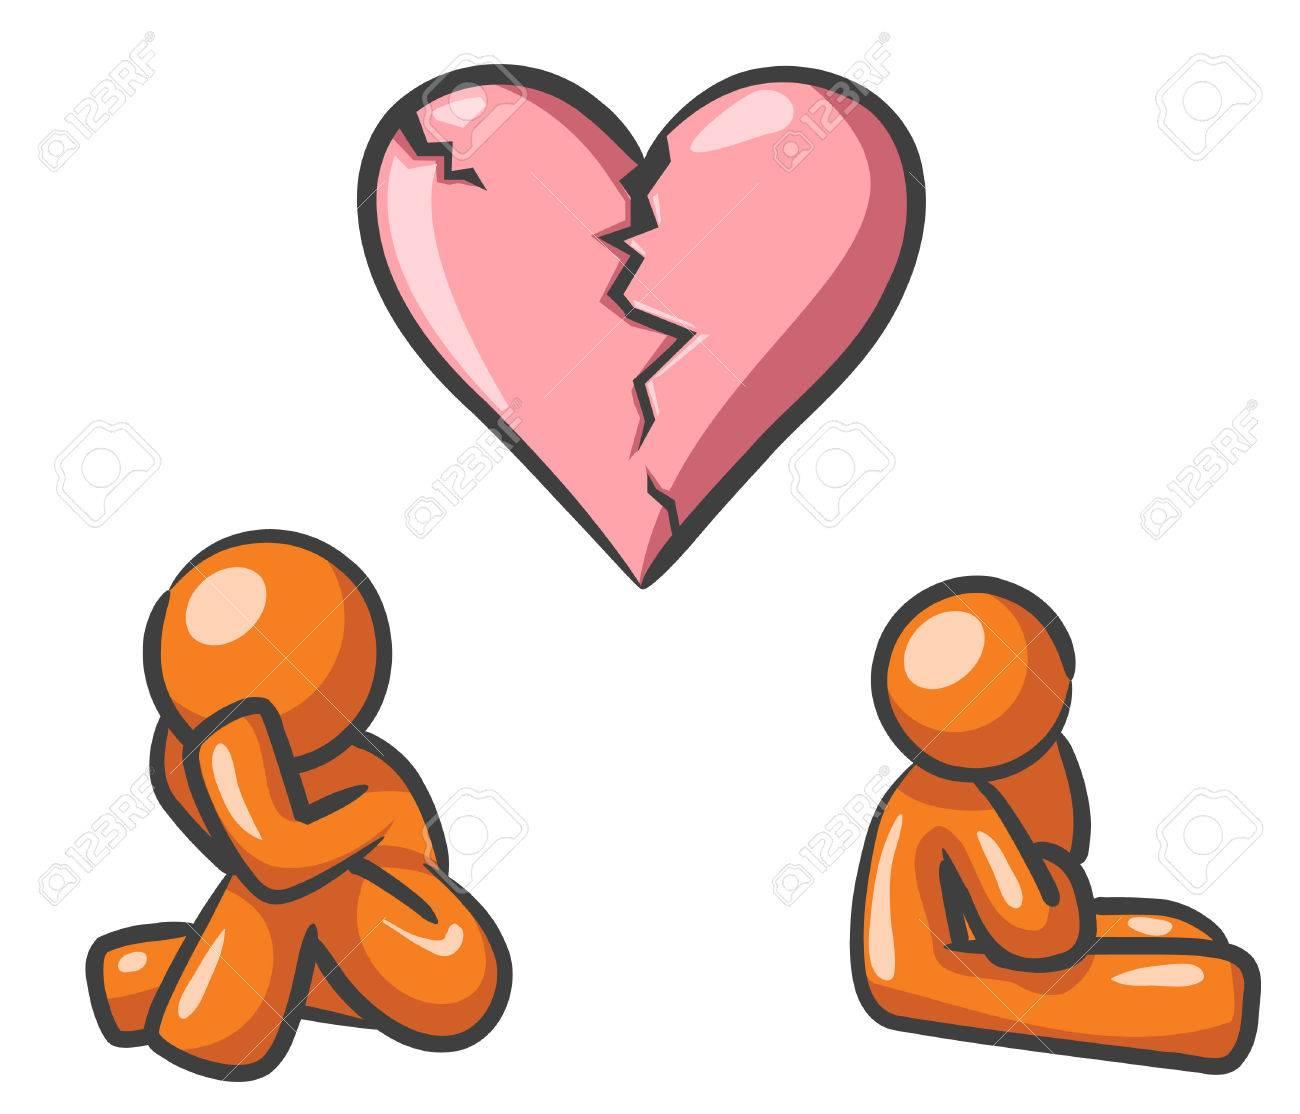 Design mascots suffering broken heart syndrome. Stock Vector - 5138701